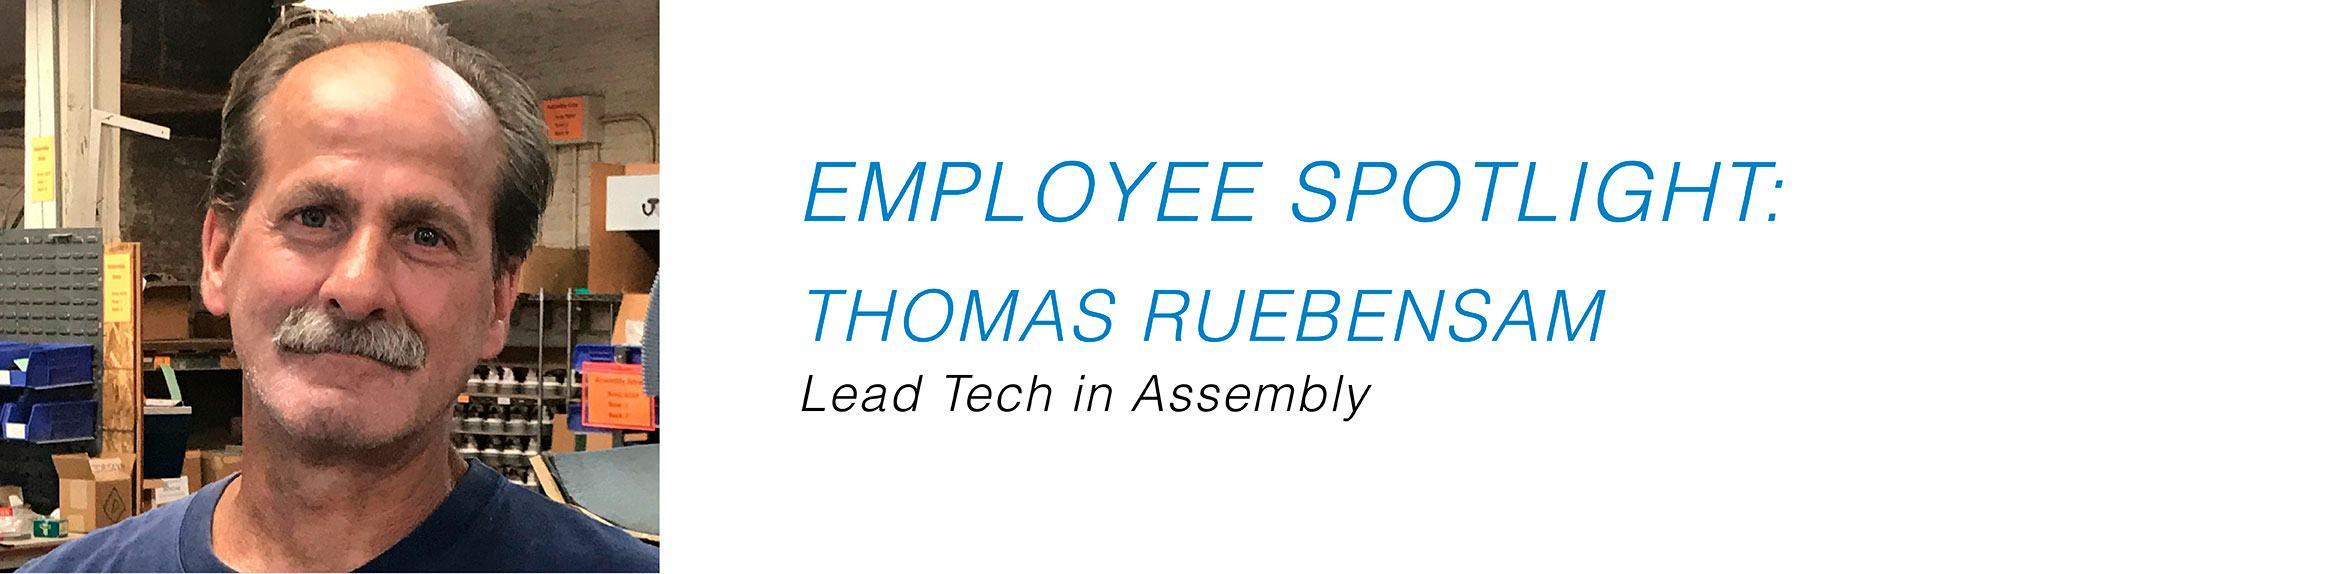 Employee Spotlight - Thomas Ruebensam